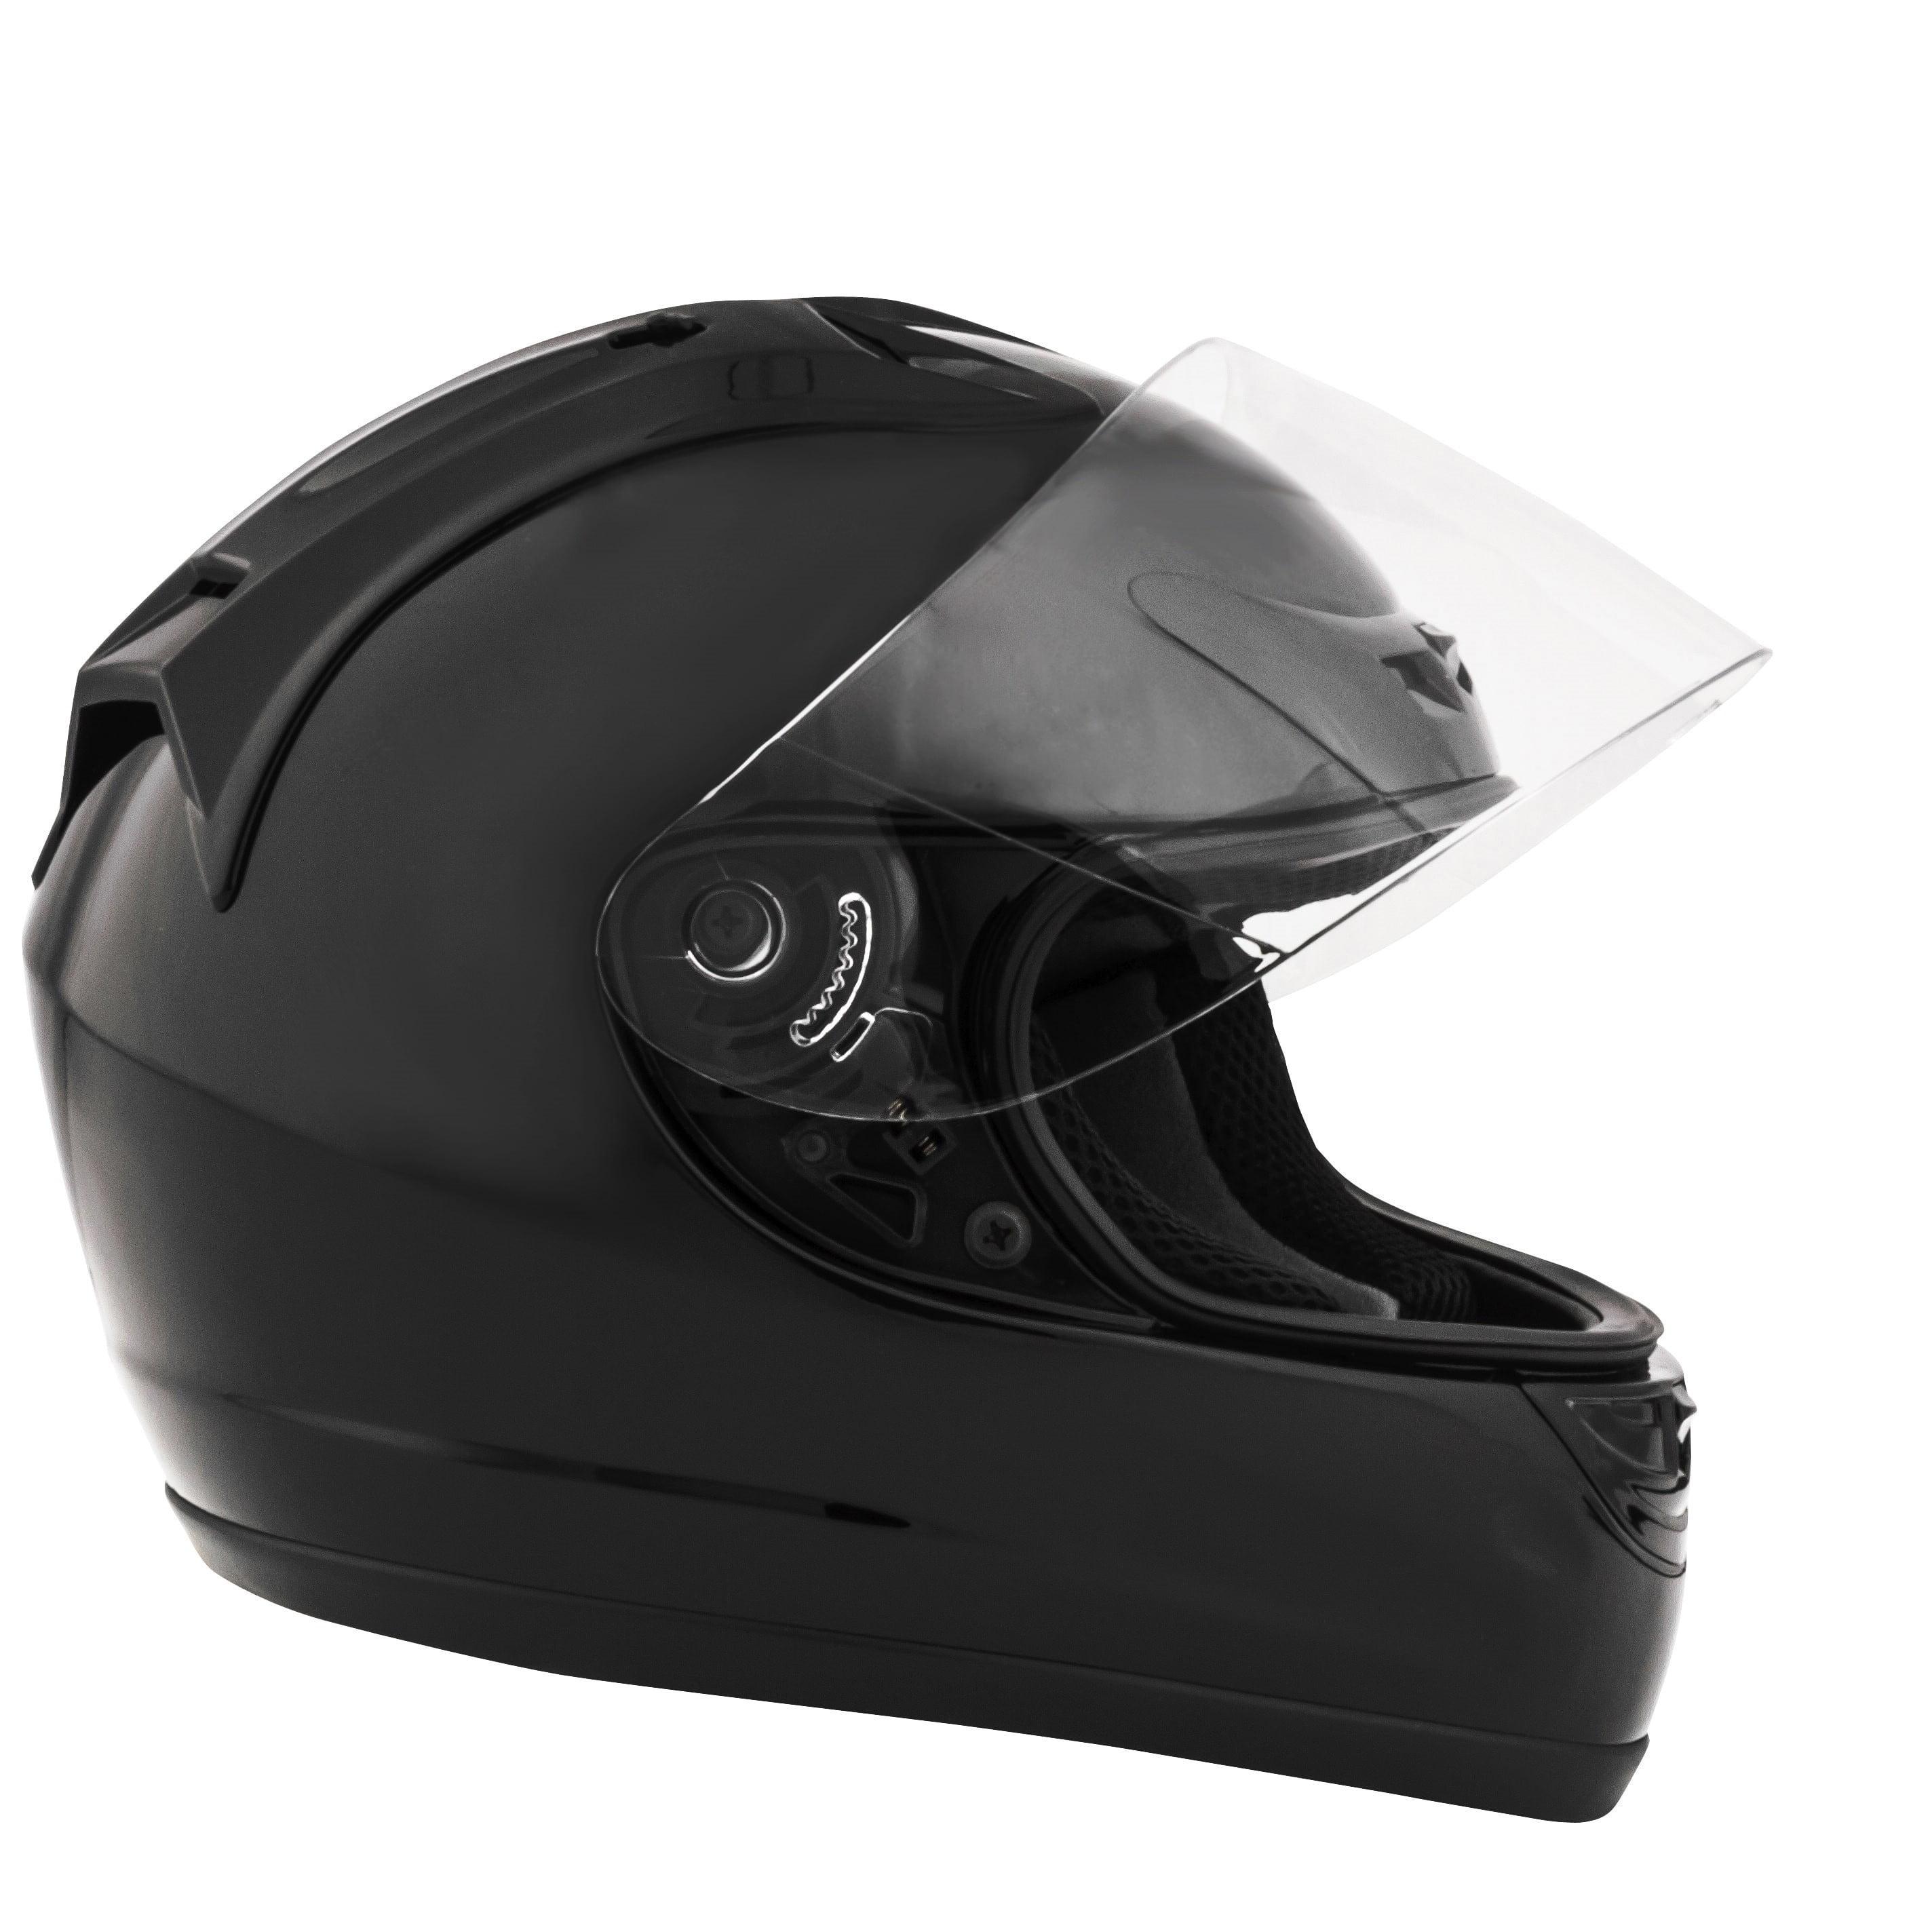 832ecc51 Fuel Helmets, Full-Face Helmet, Matte Black, Sizes S to XL - Walmart.com